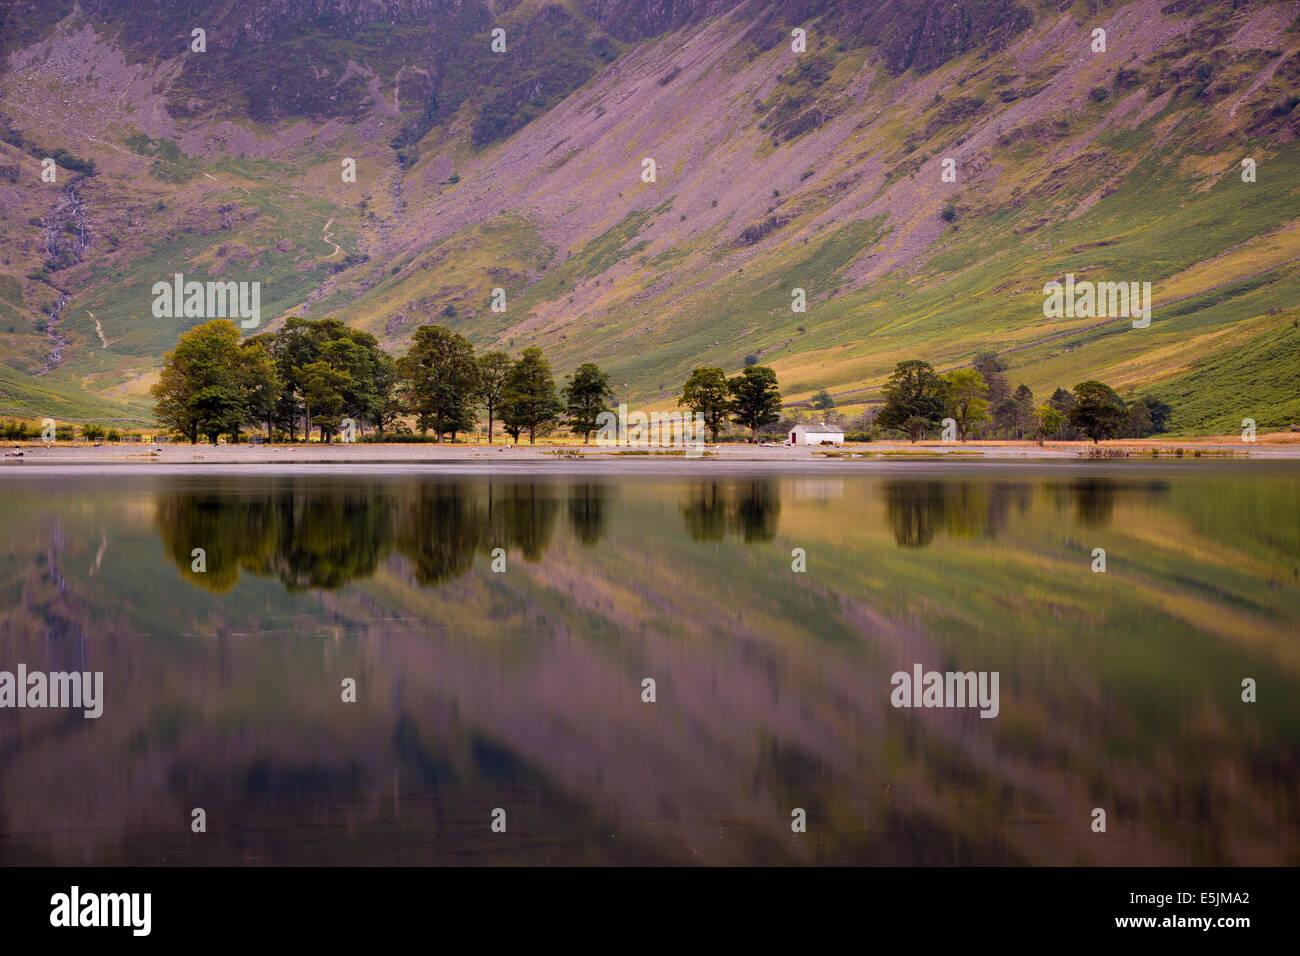 Reflexiones previas al amanecer sobre el lago Buttermere, Cumbria, Lake District, Inglaterra Imagen De Stock